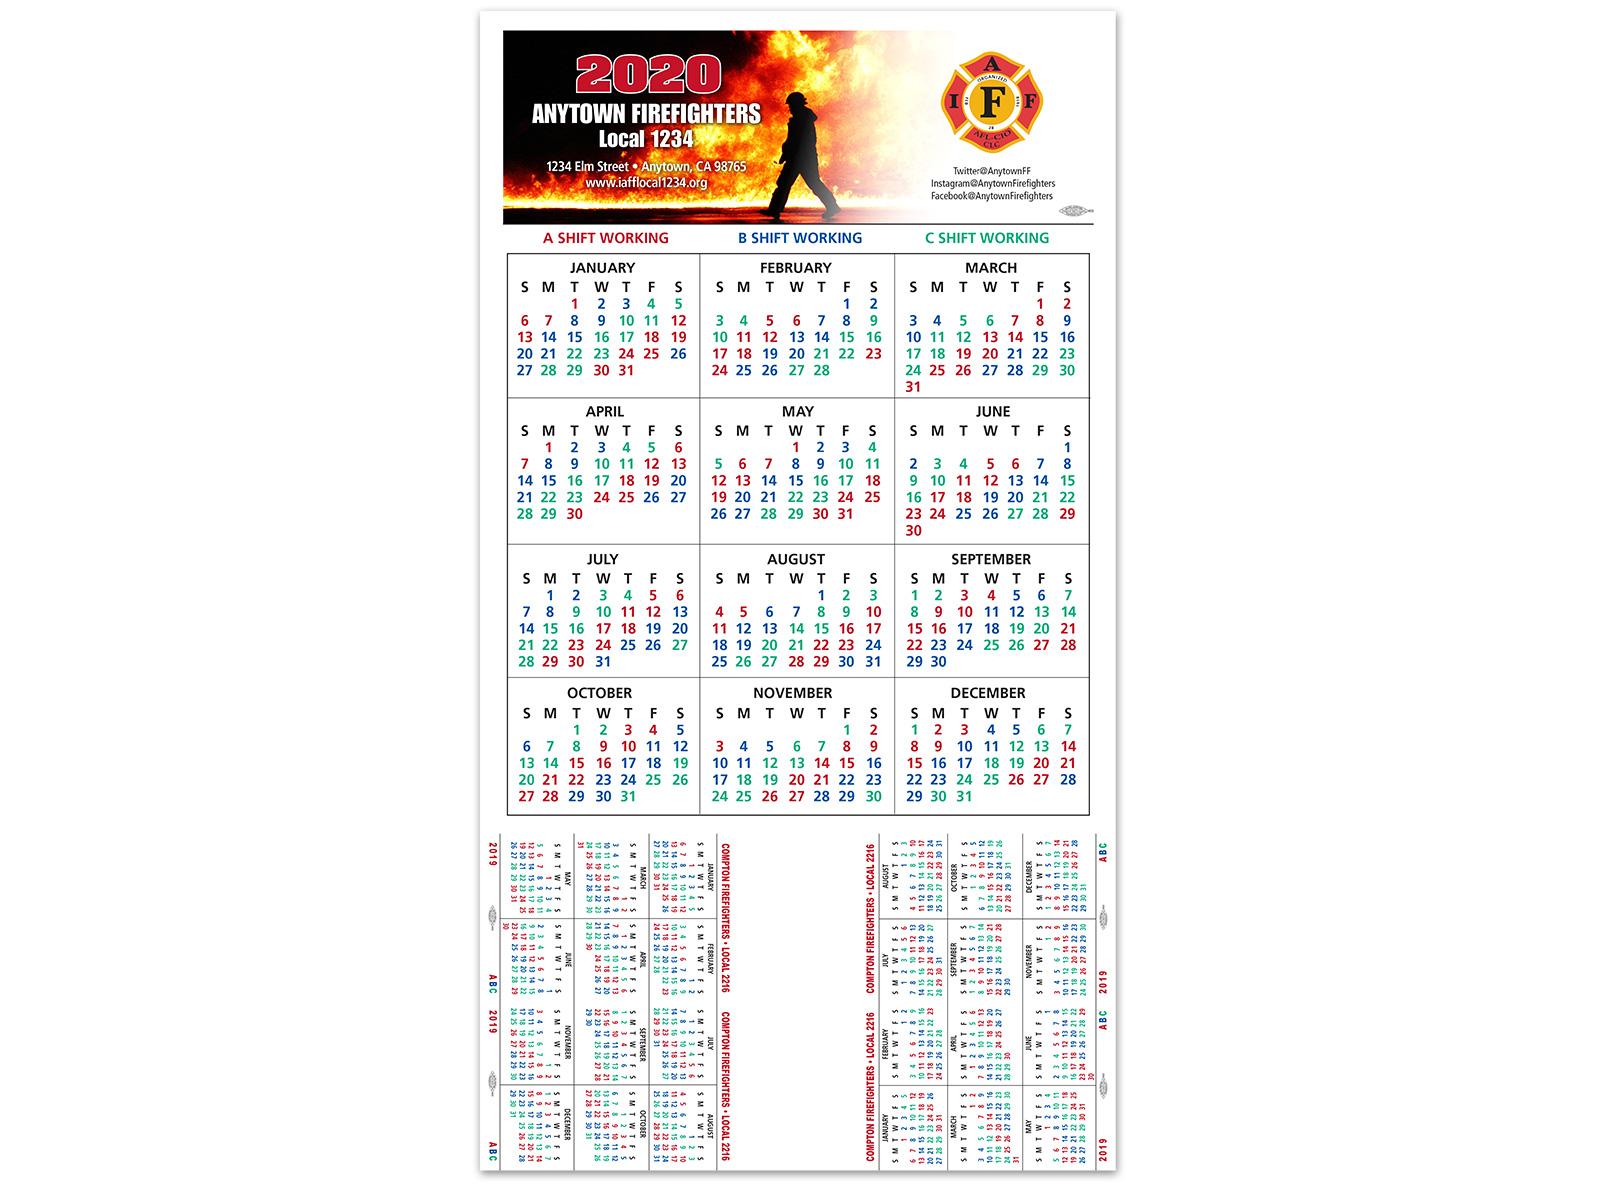 Shift Calendars — Firefighters Print & Design